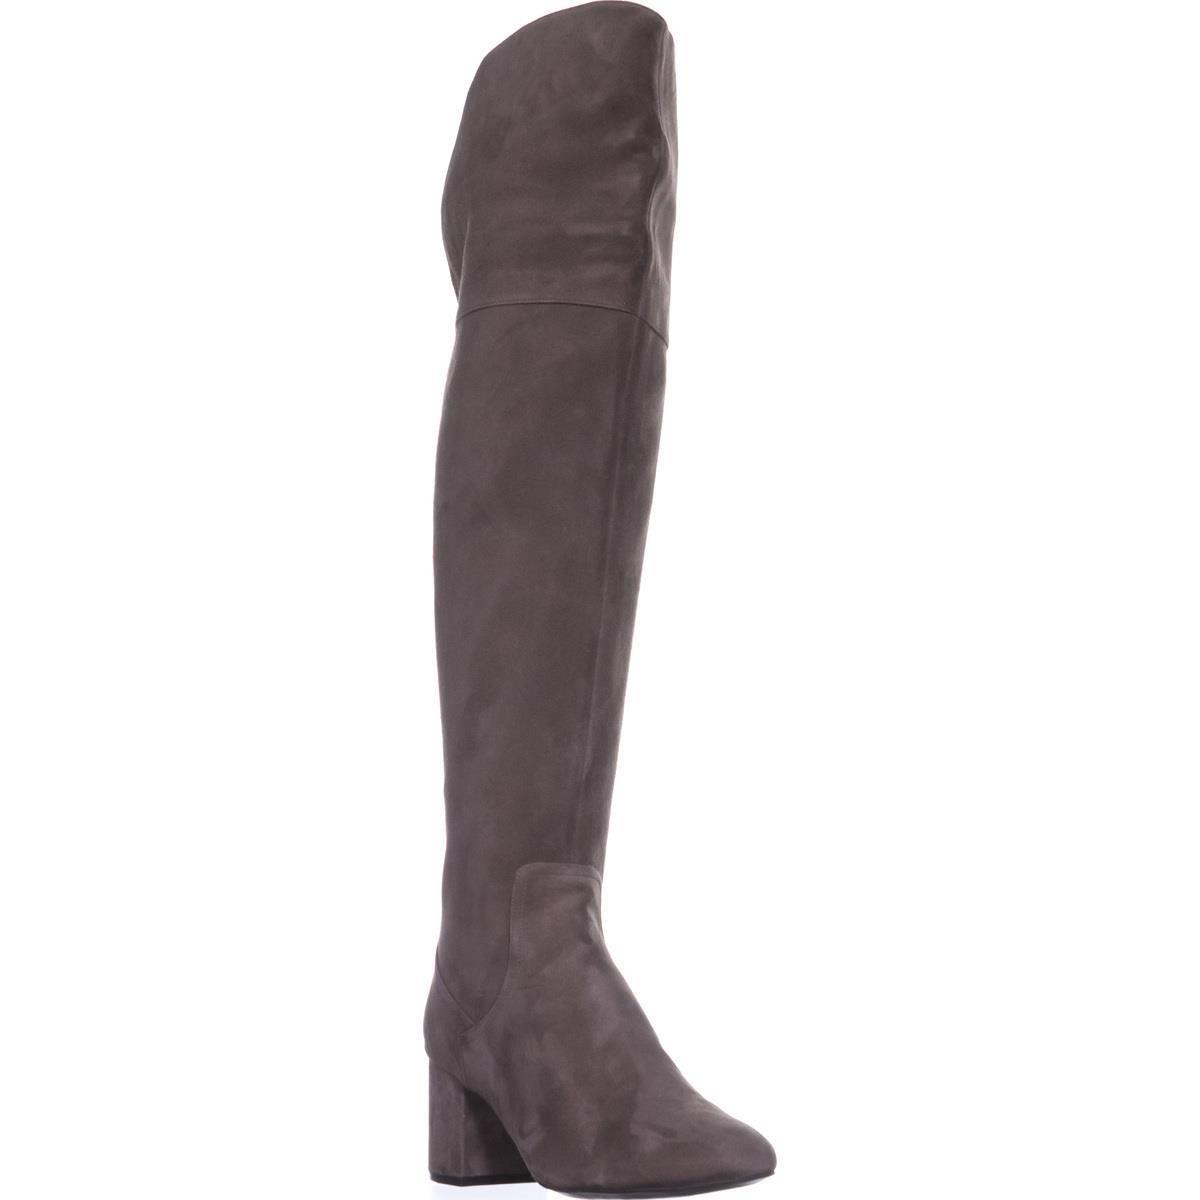 3542eeaaef3 Cole Haan Raina Grand Over-the-knee Boots